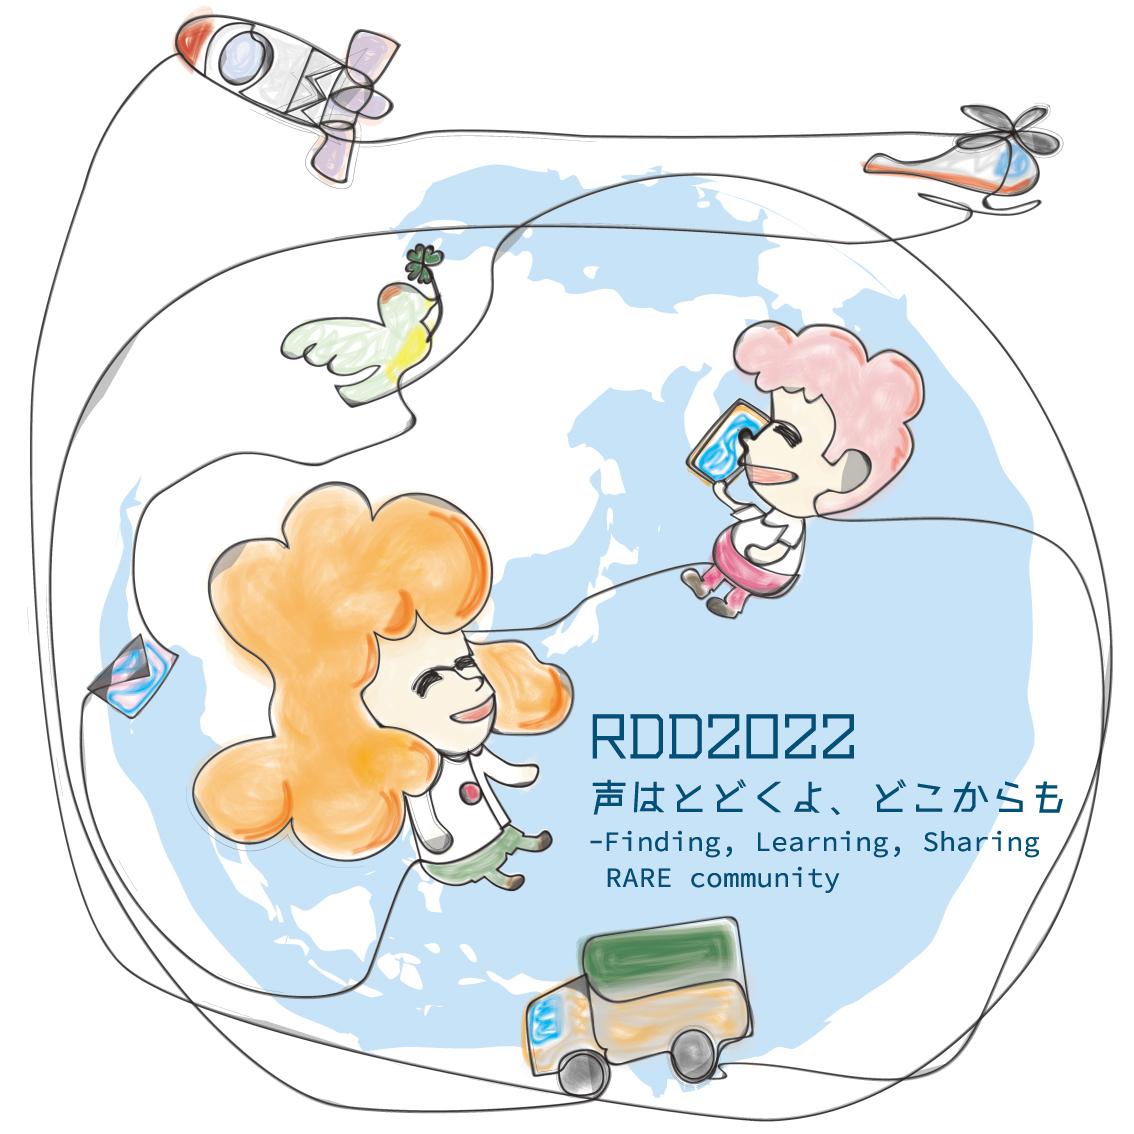 RDD 2022 キービジュアル